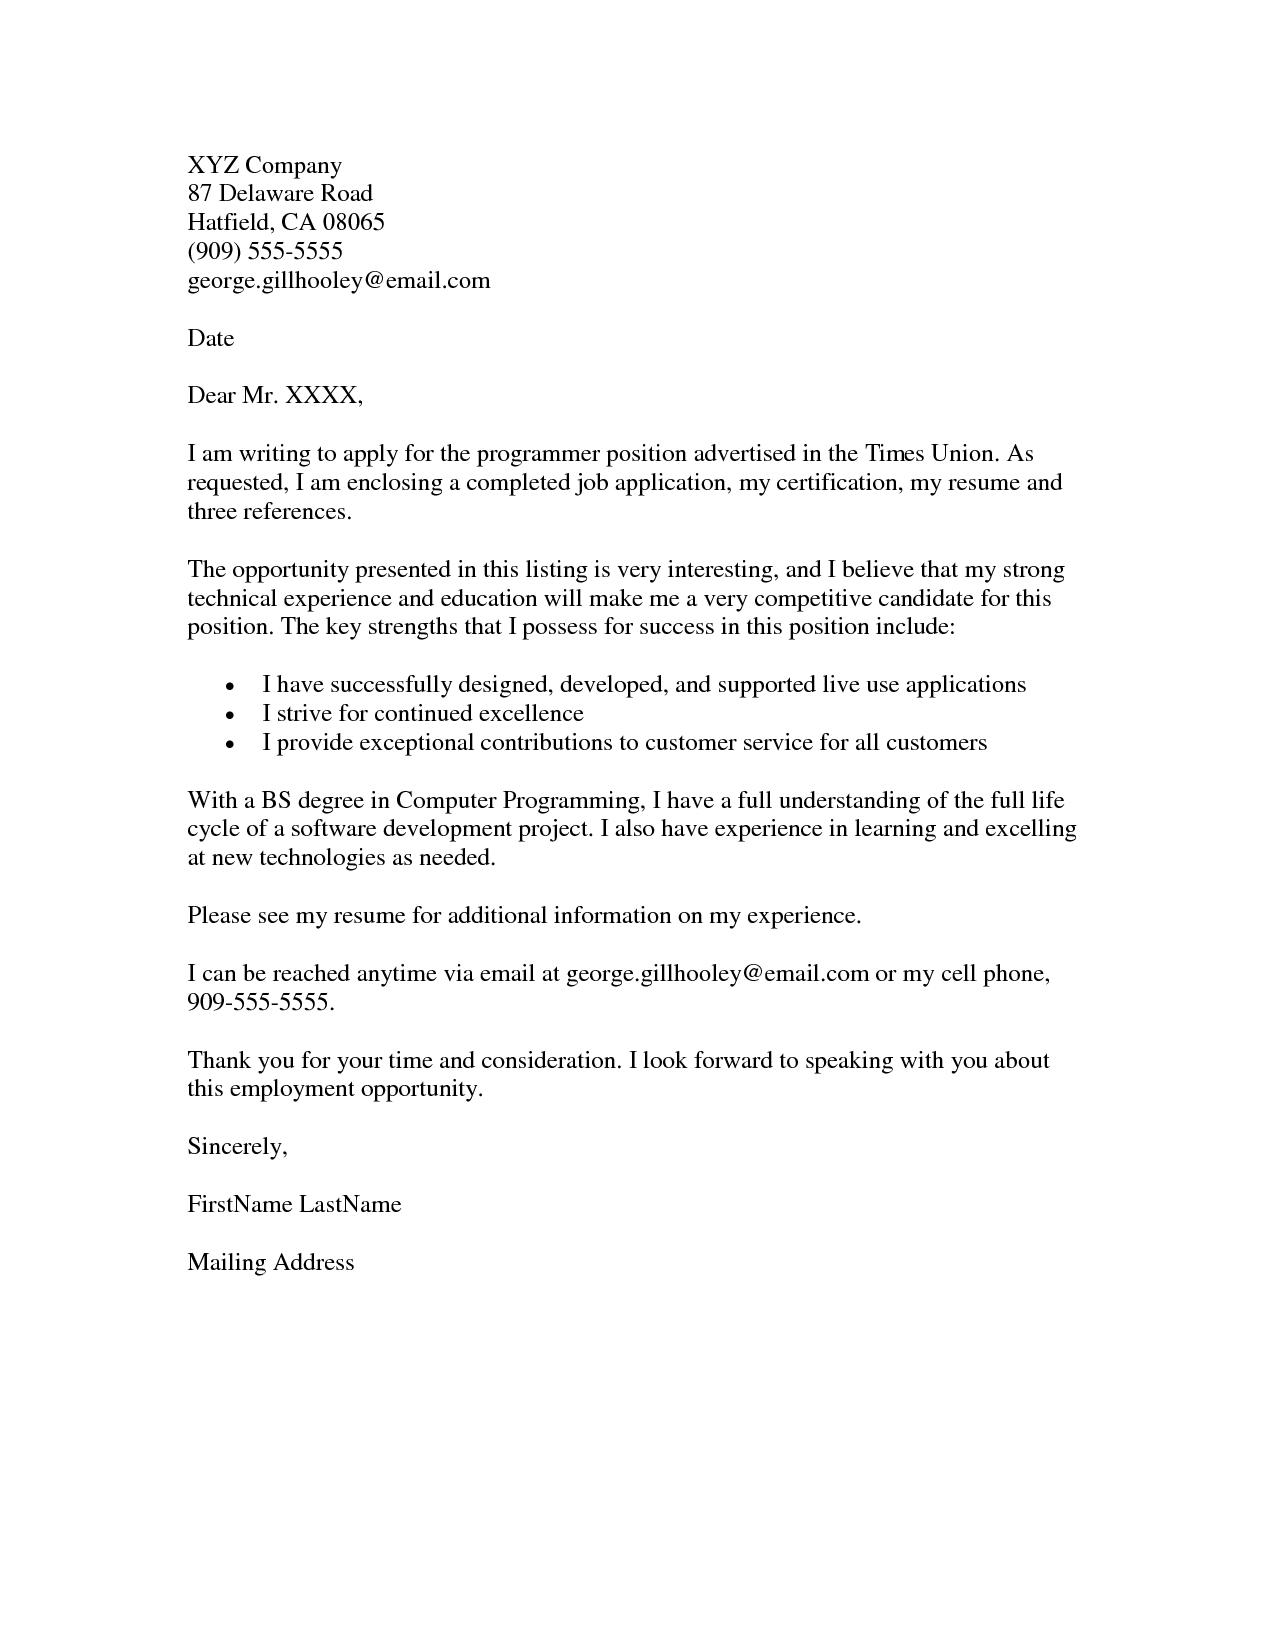 moore wilsons application letter